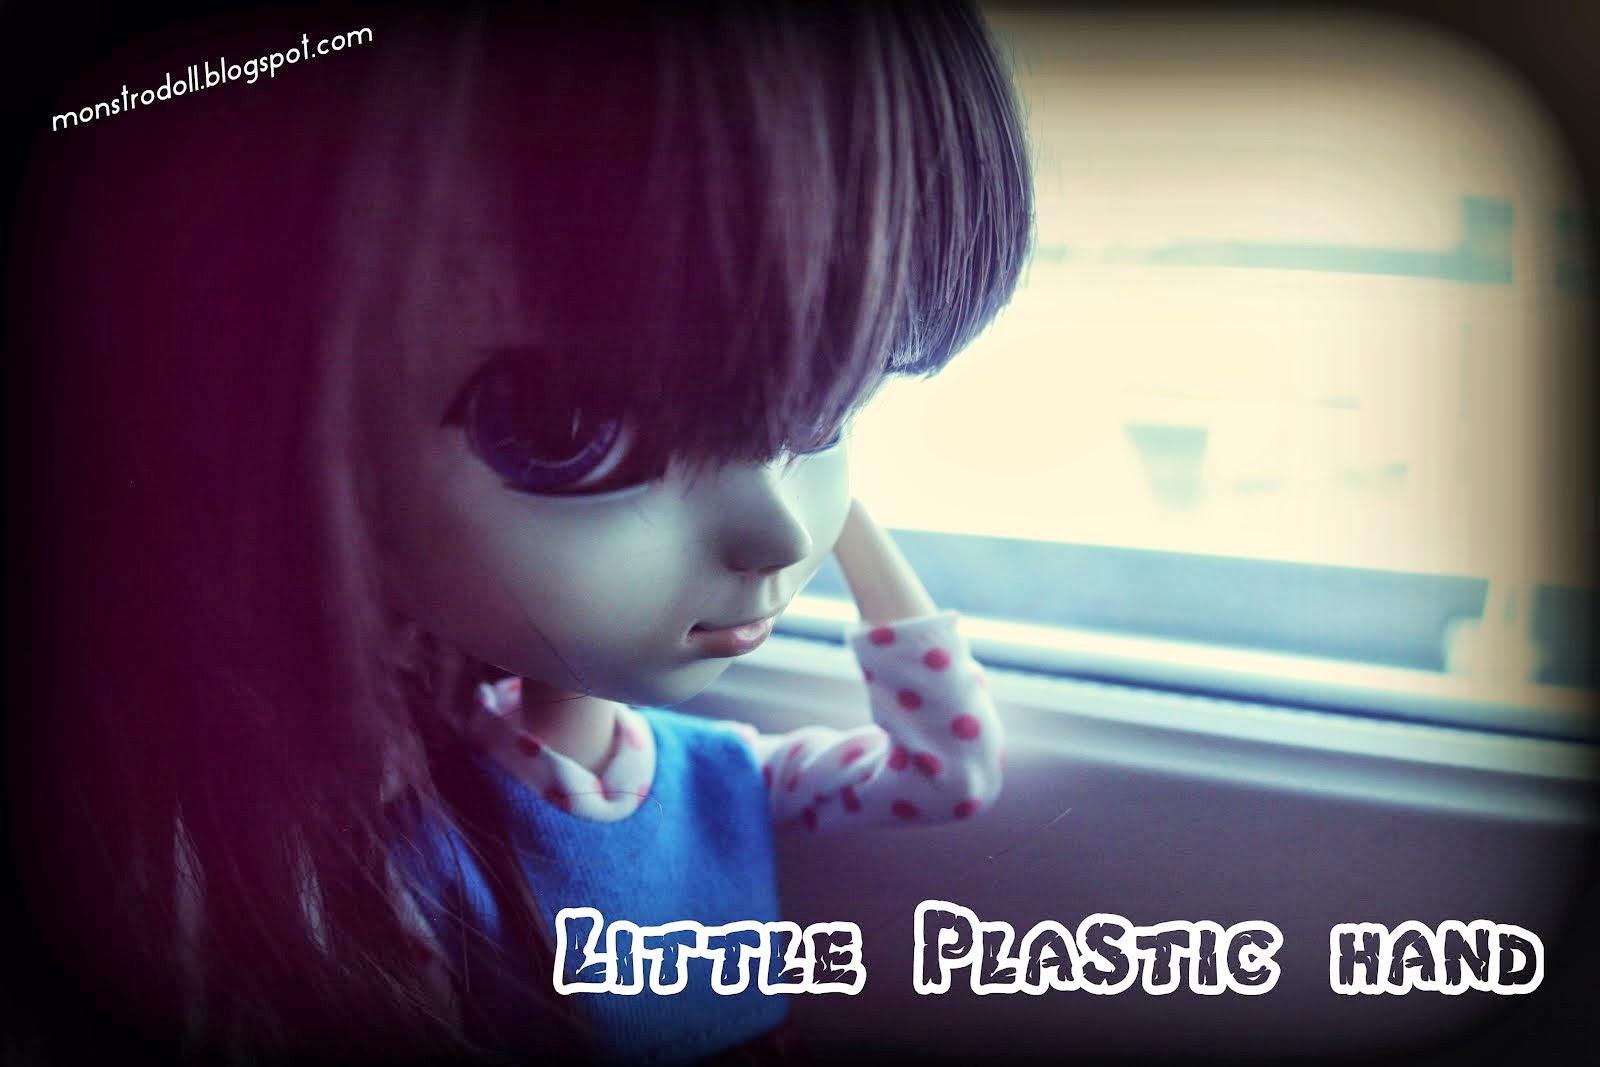 Little plastic hand